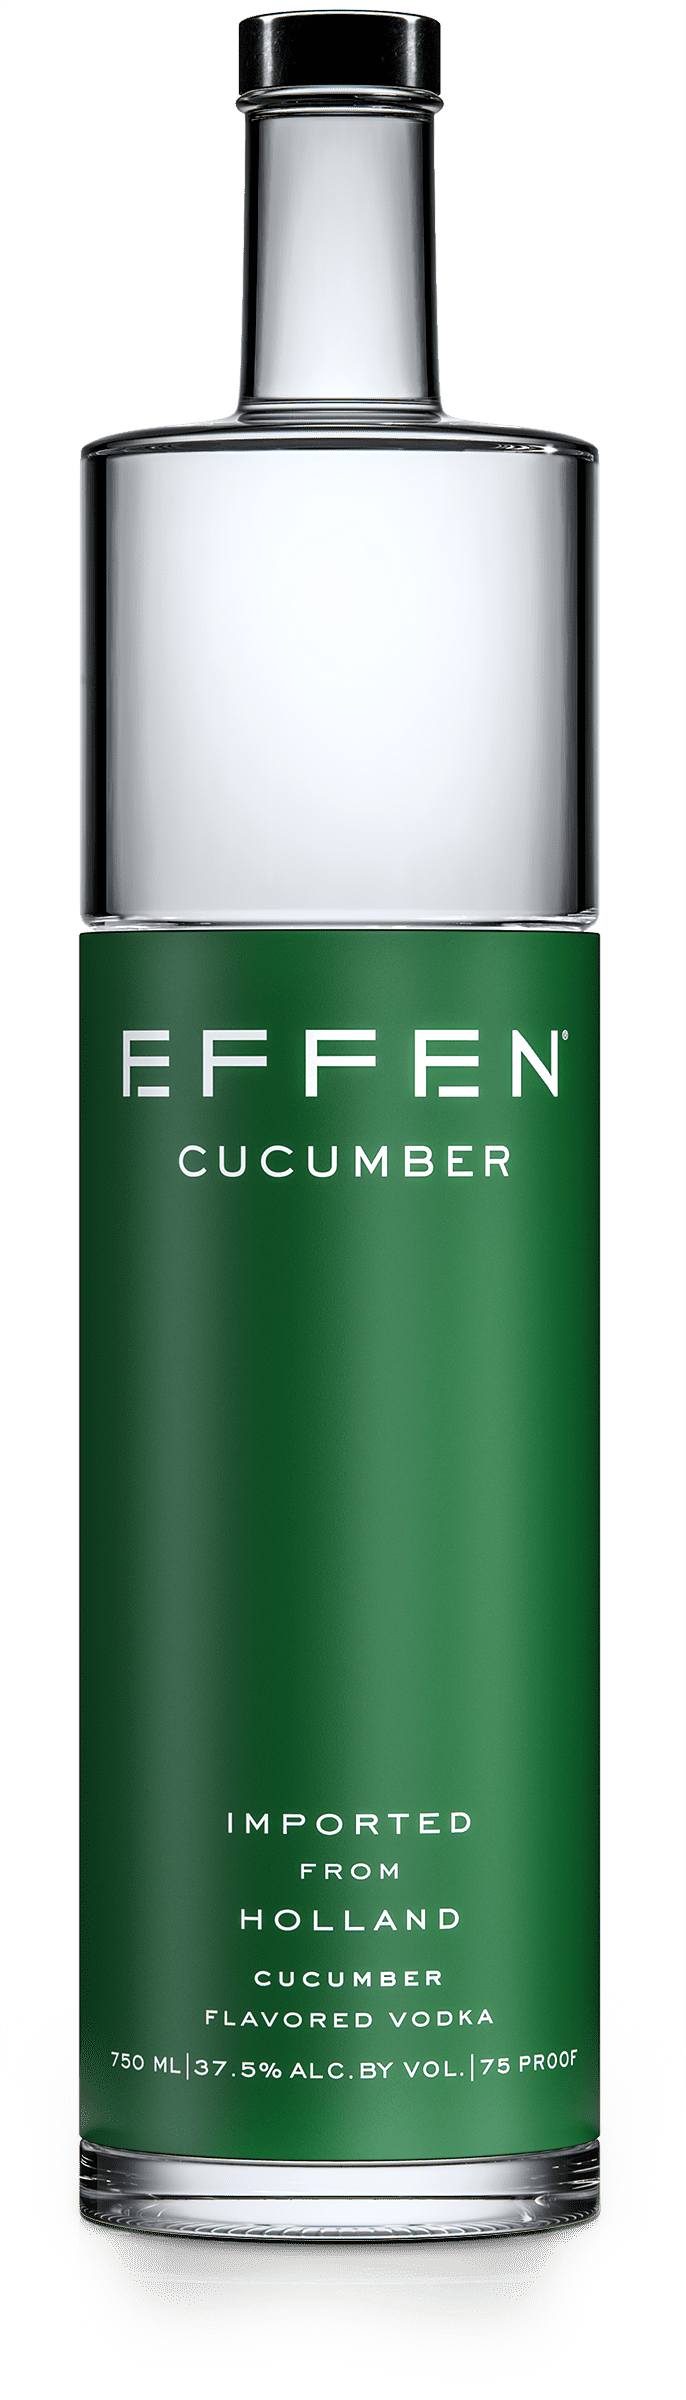 EFFEN Cucumber Vodka bottle shot